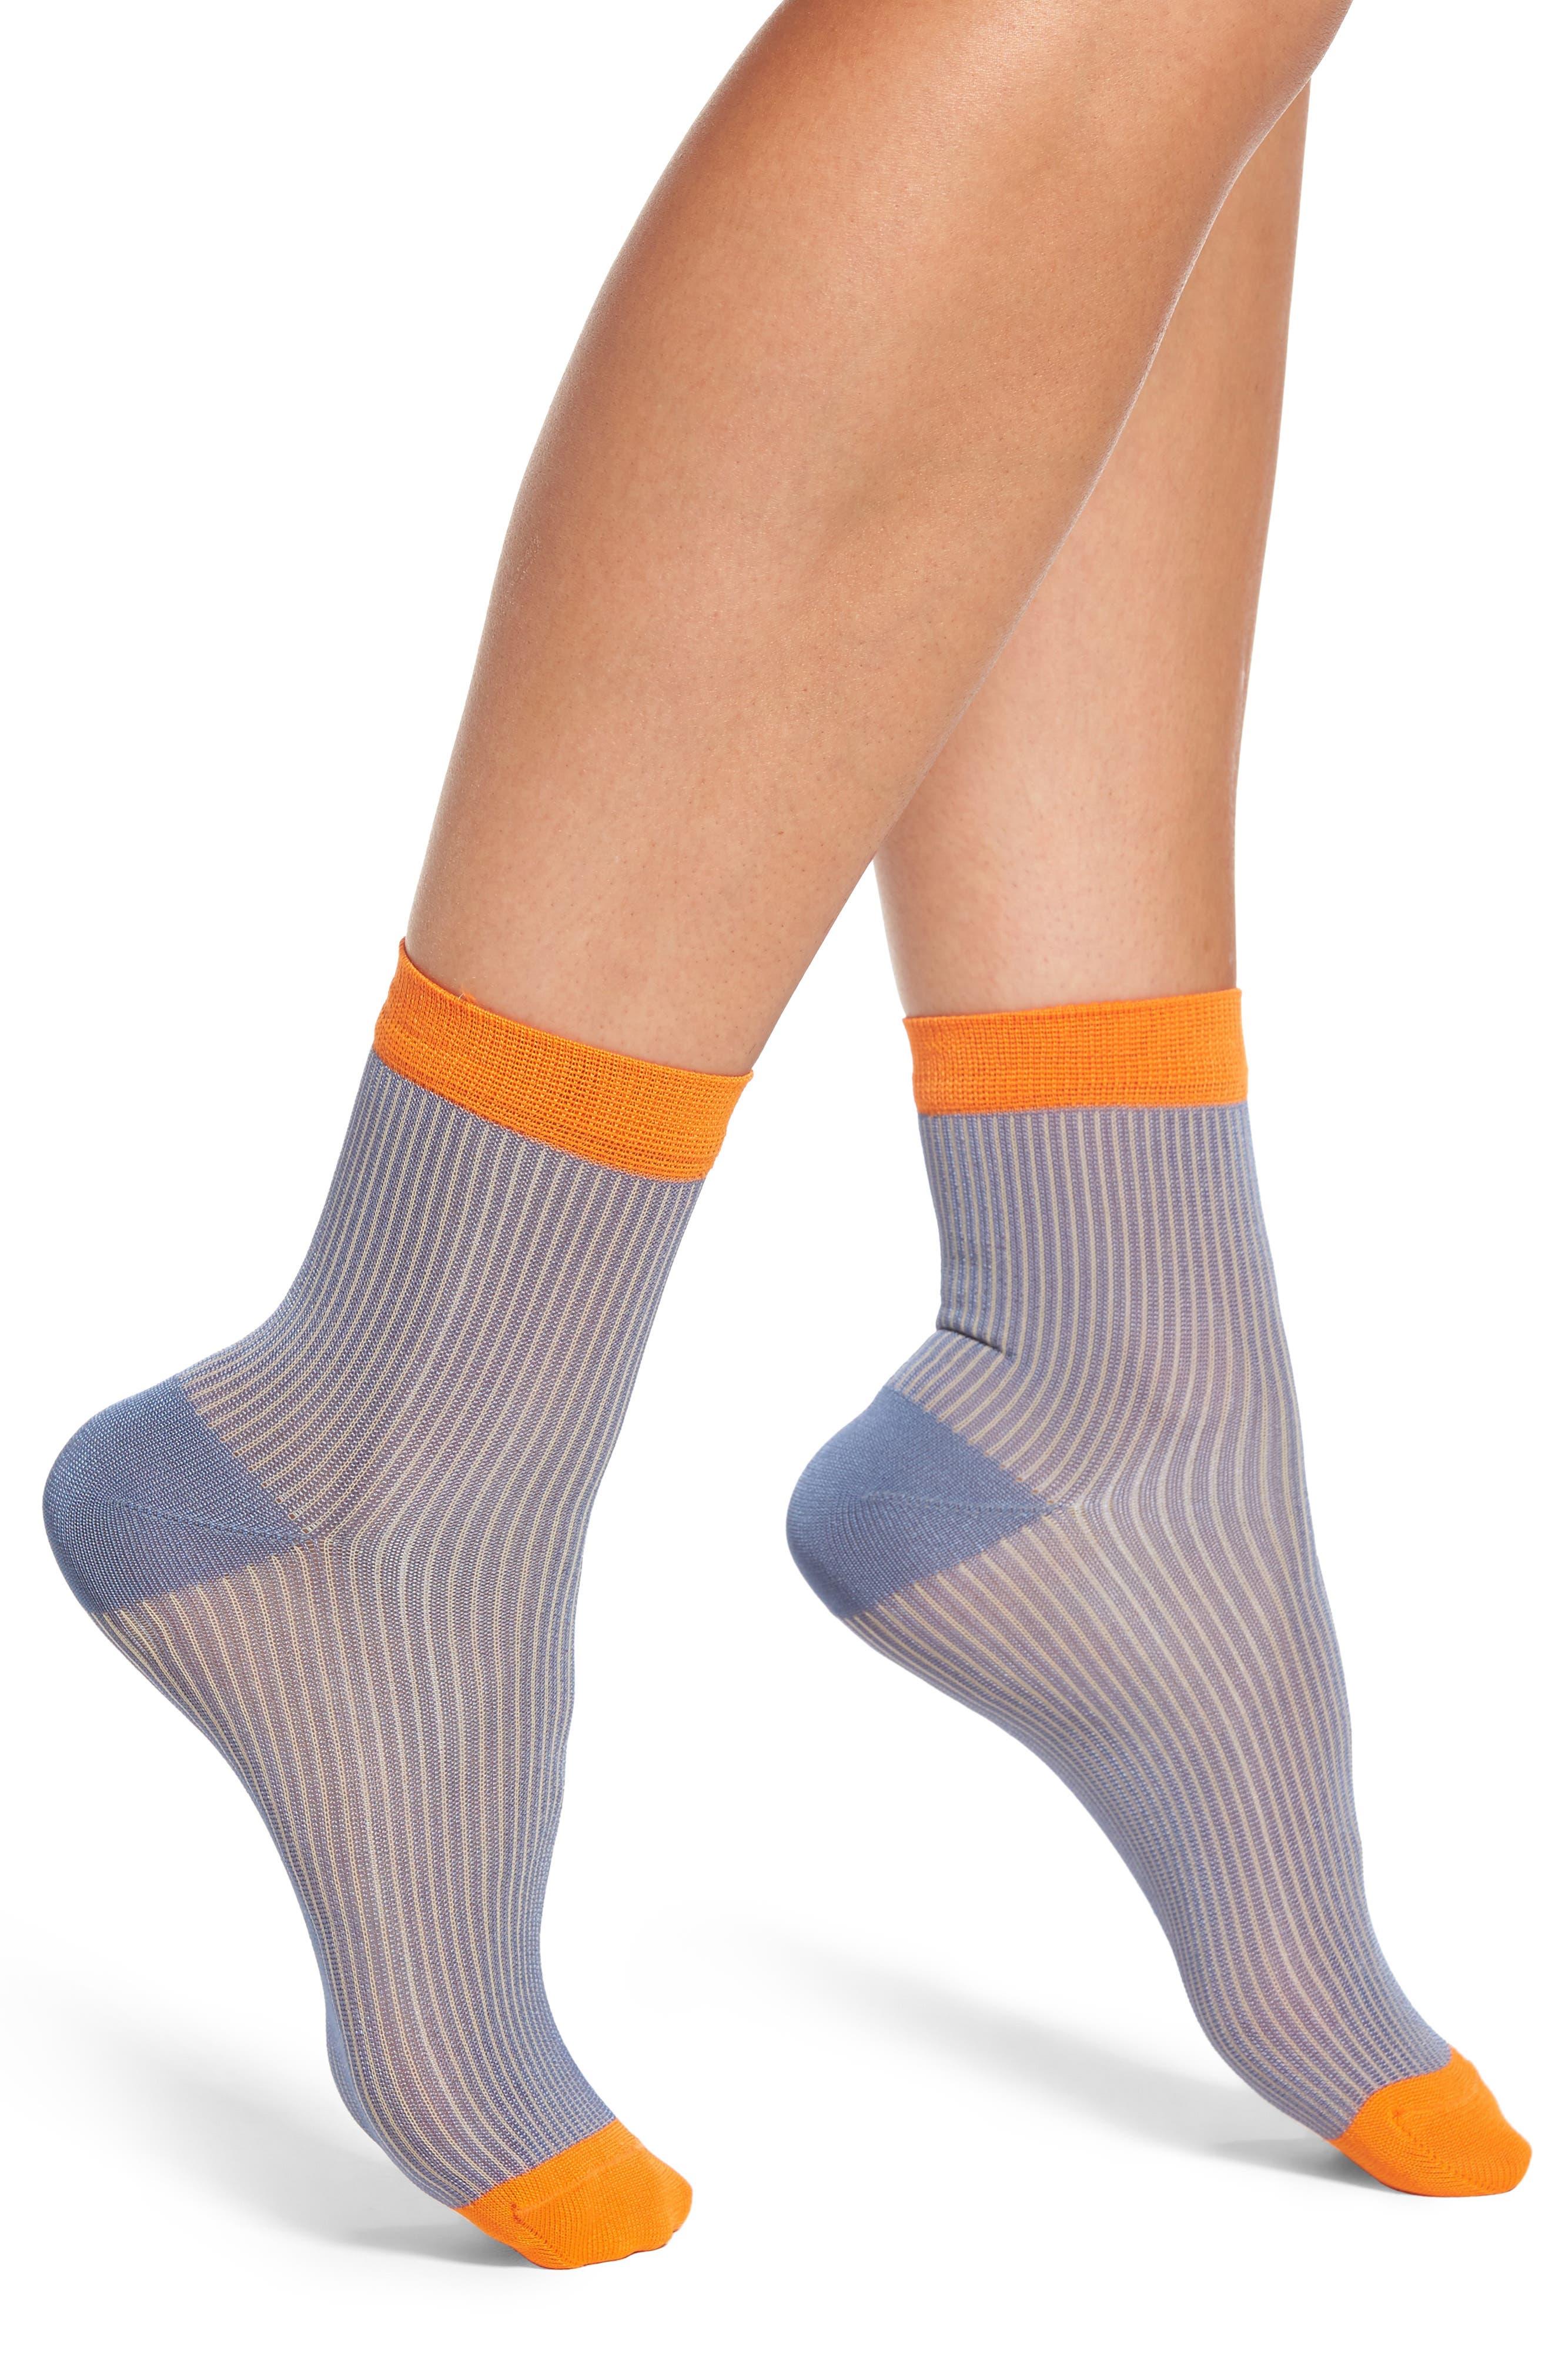 Rita Ankle Socks,                             Main thumbnail 1, color,                             400